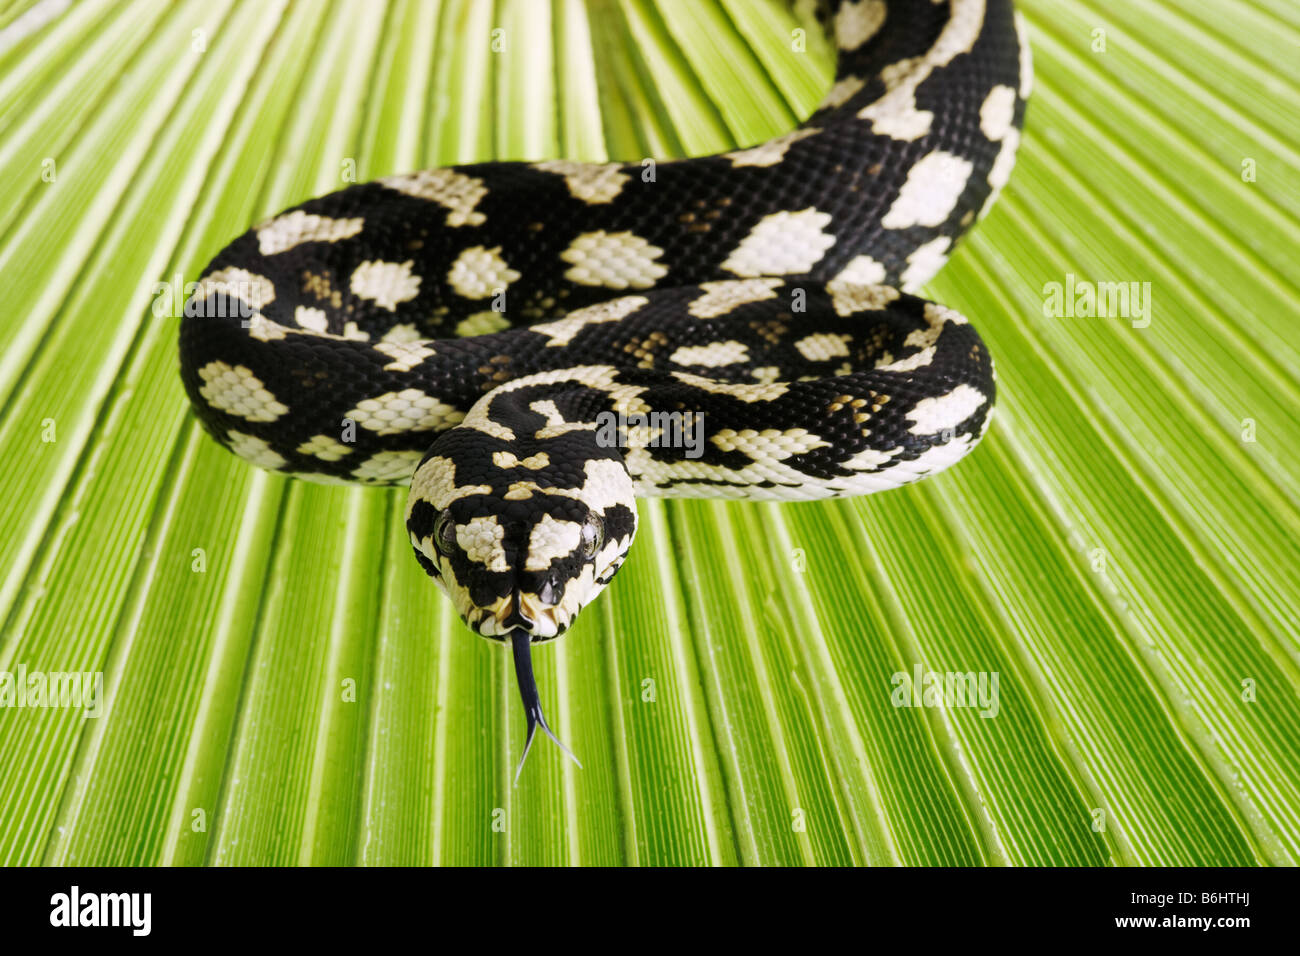 Jungle Carpet Pythons Morelia spilota cheynei Non venomous python species found in rainforests areas Australia - Stock Image